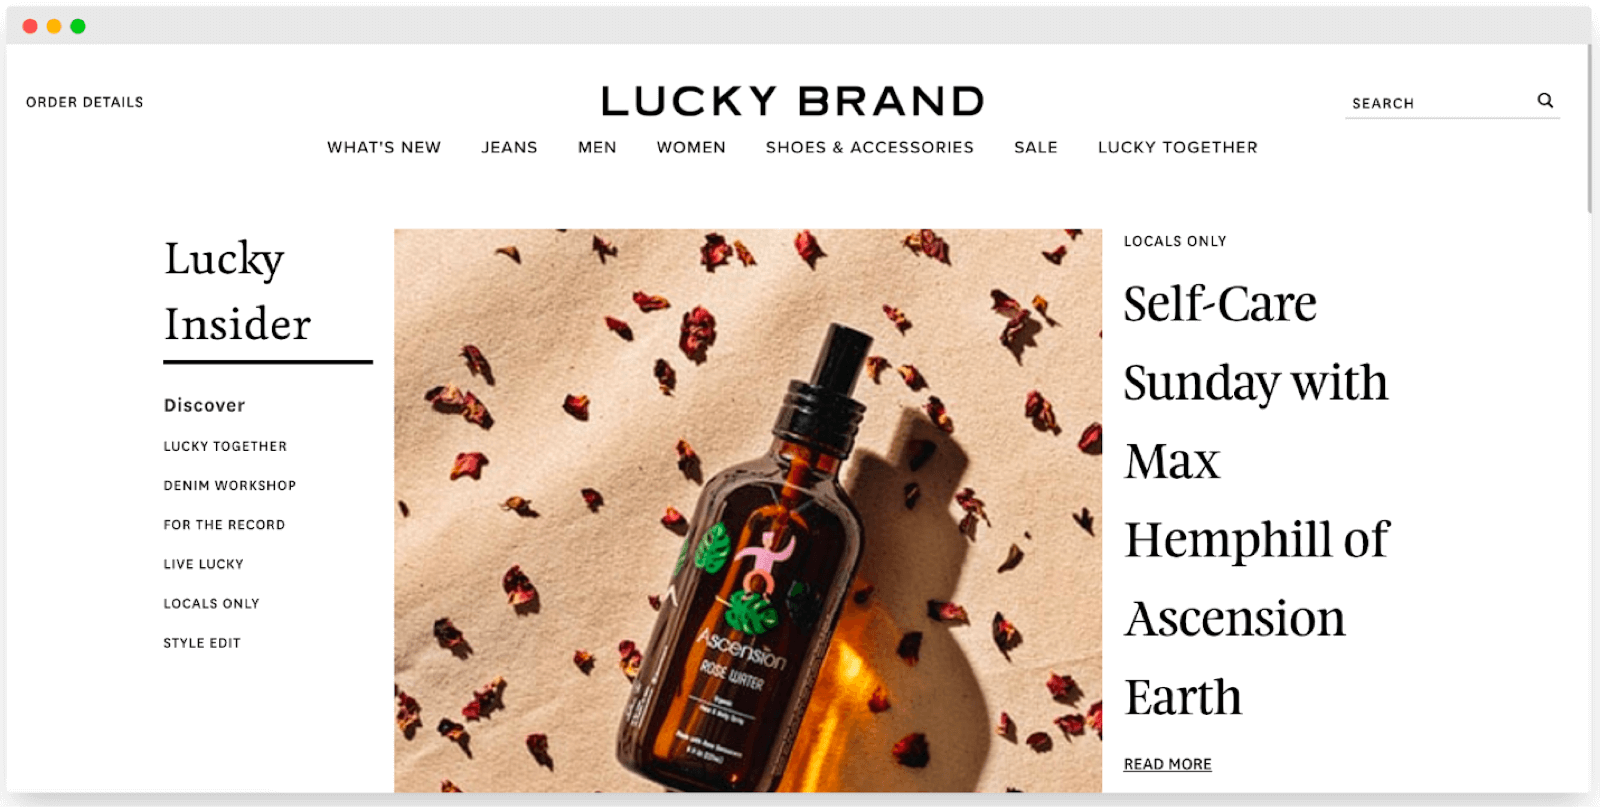 Lucky Brand content featuring employee brands